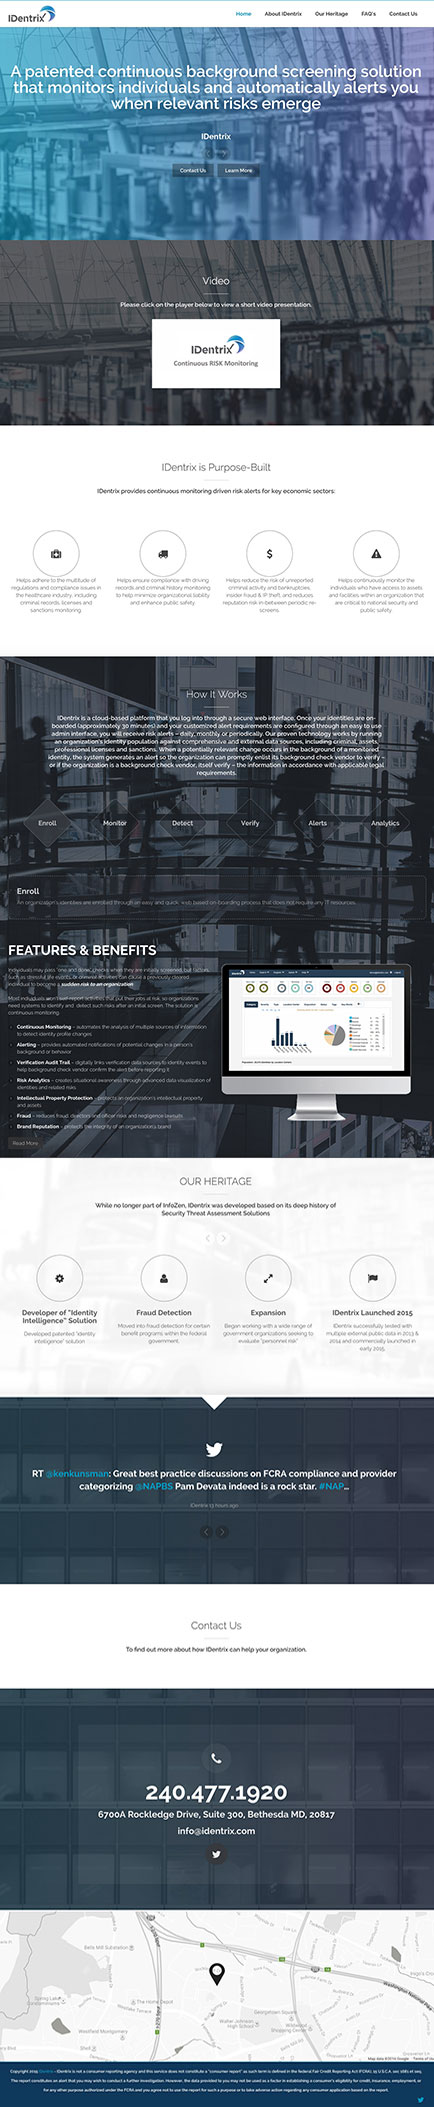 IDentrix Website Before